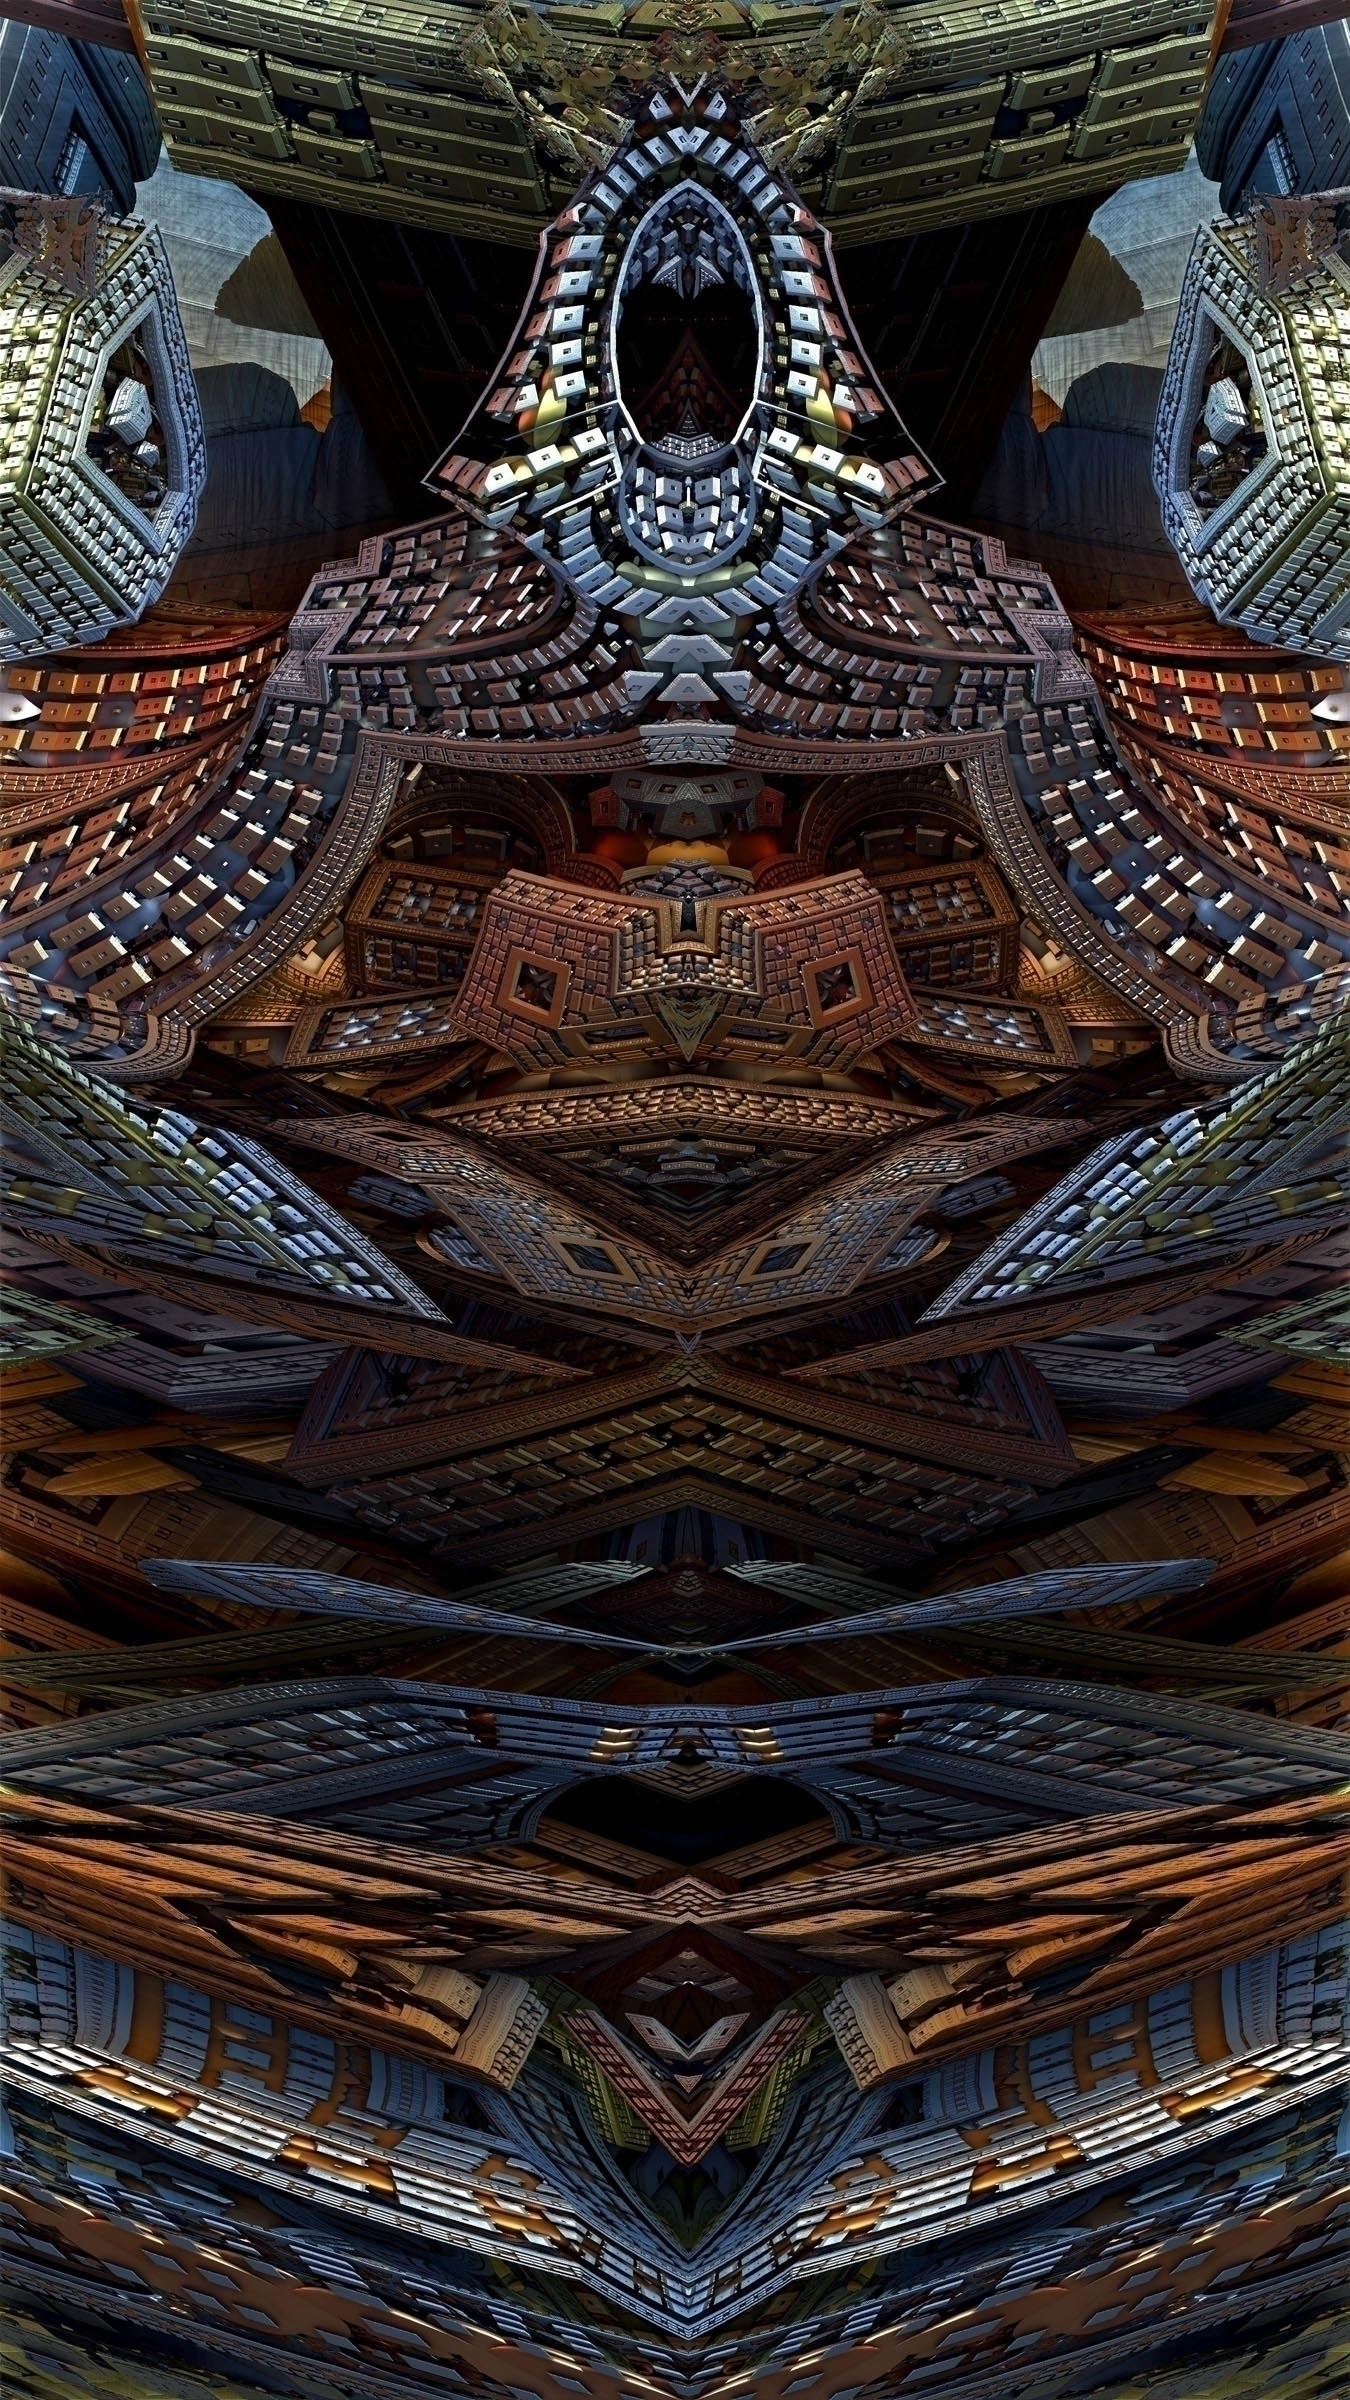 Hathor-Sekhmet guarding levels  - zygzwurx | ello